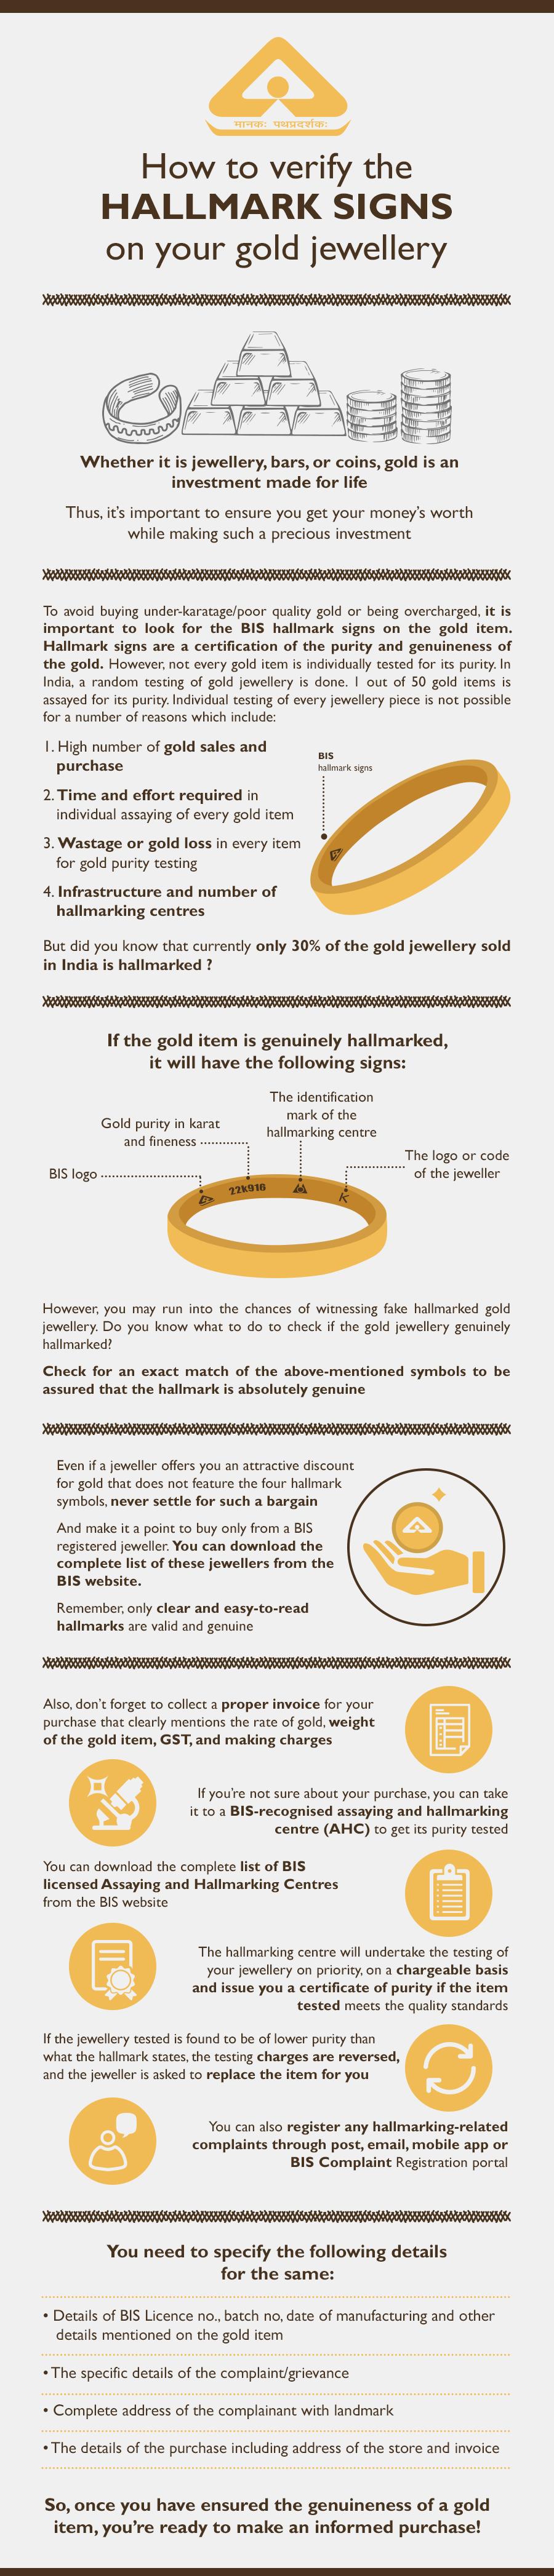 Hallmark signs on gold jewellery